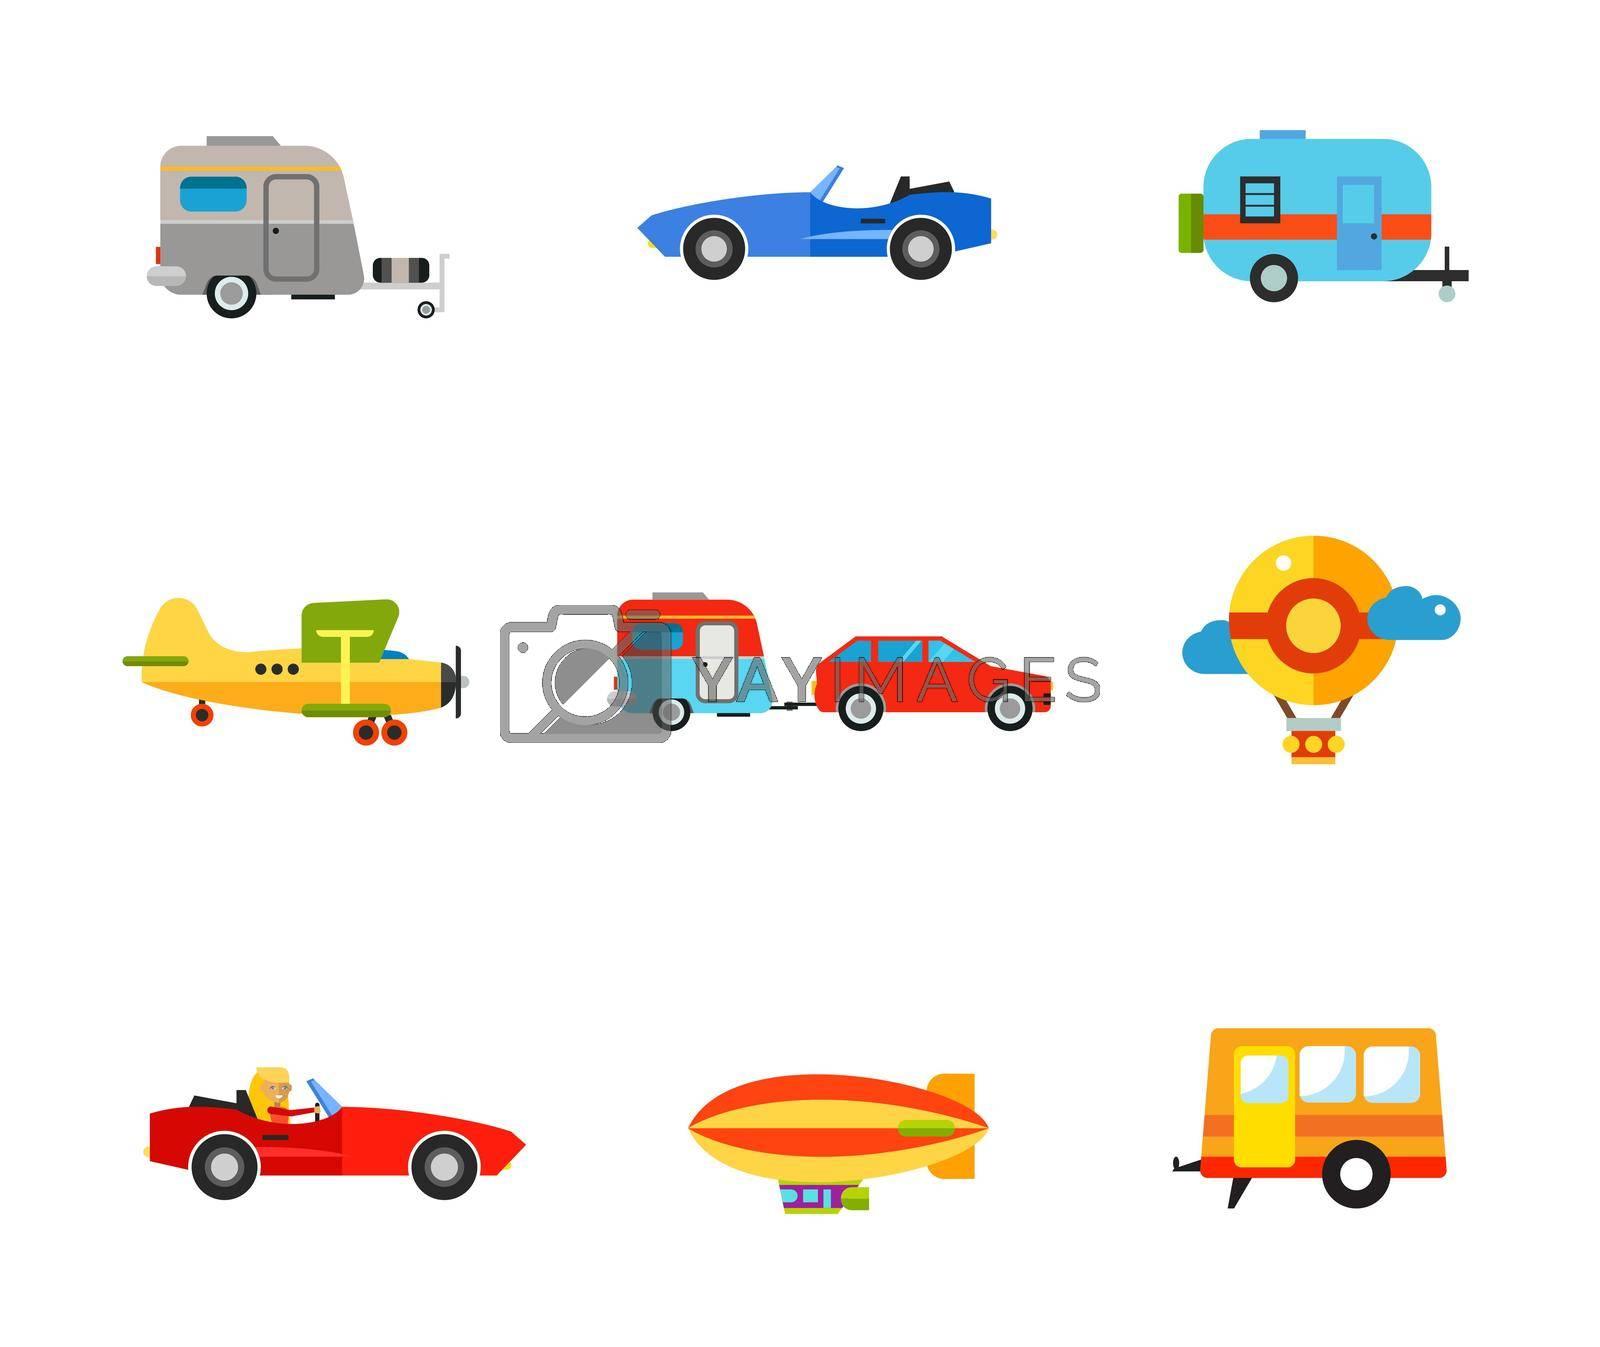 Transportation icon set. Caravan Cabriolet Biplane Caravan Travel Car Air Balloon Woman in Cabriolet Air Ship Trailer